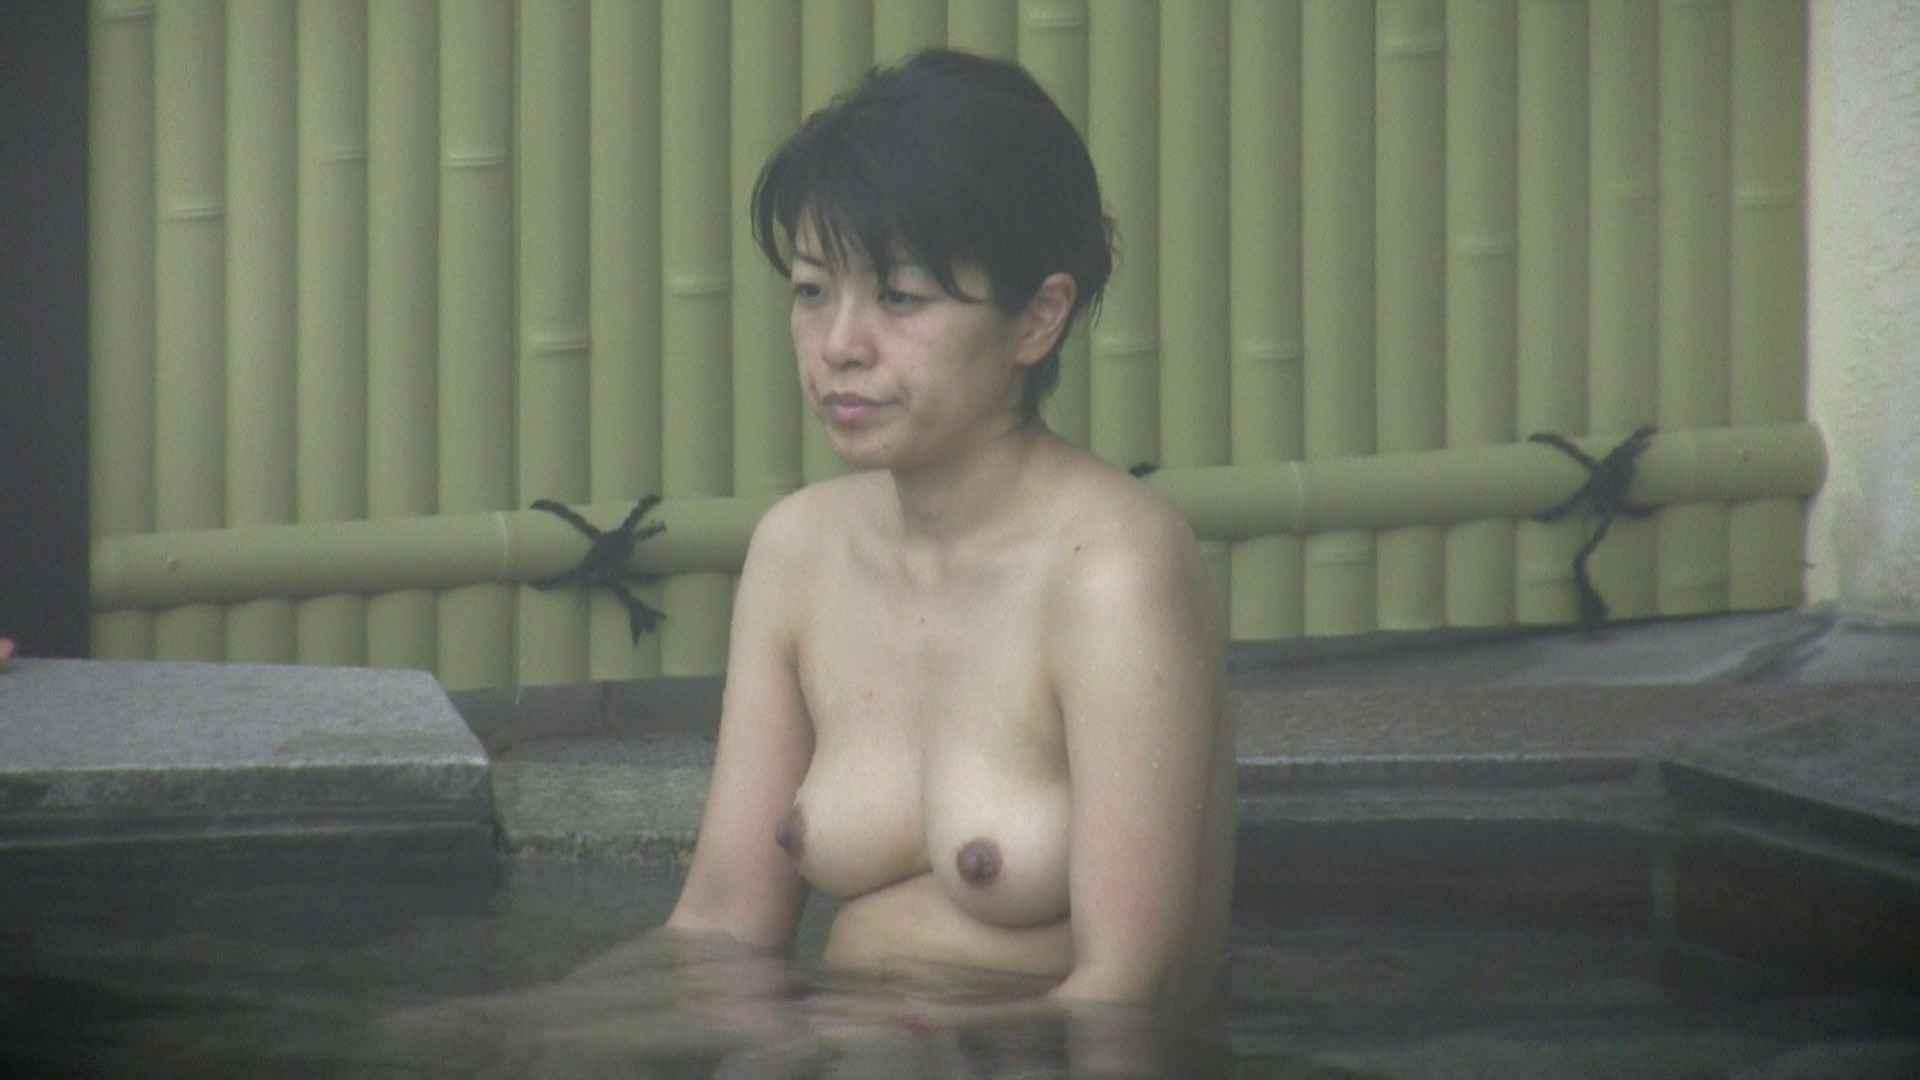 Aquaな露天風呂Vol.585 露天 アダルト動画キャプチャ 78PICs 47